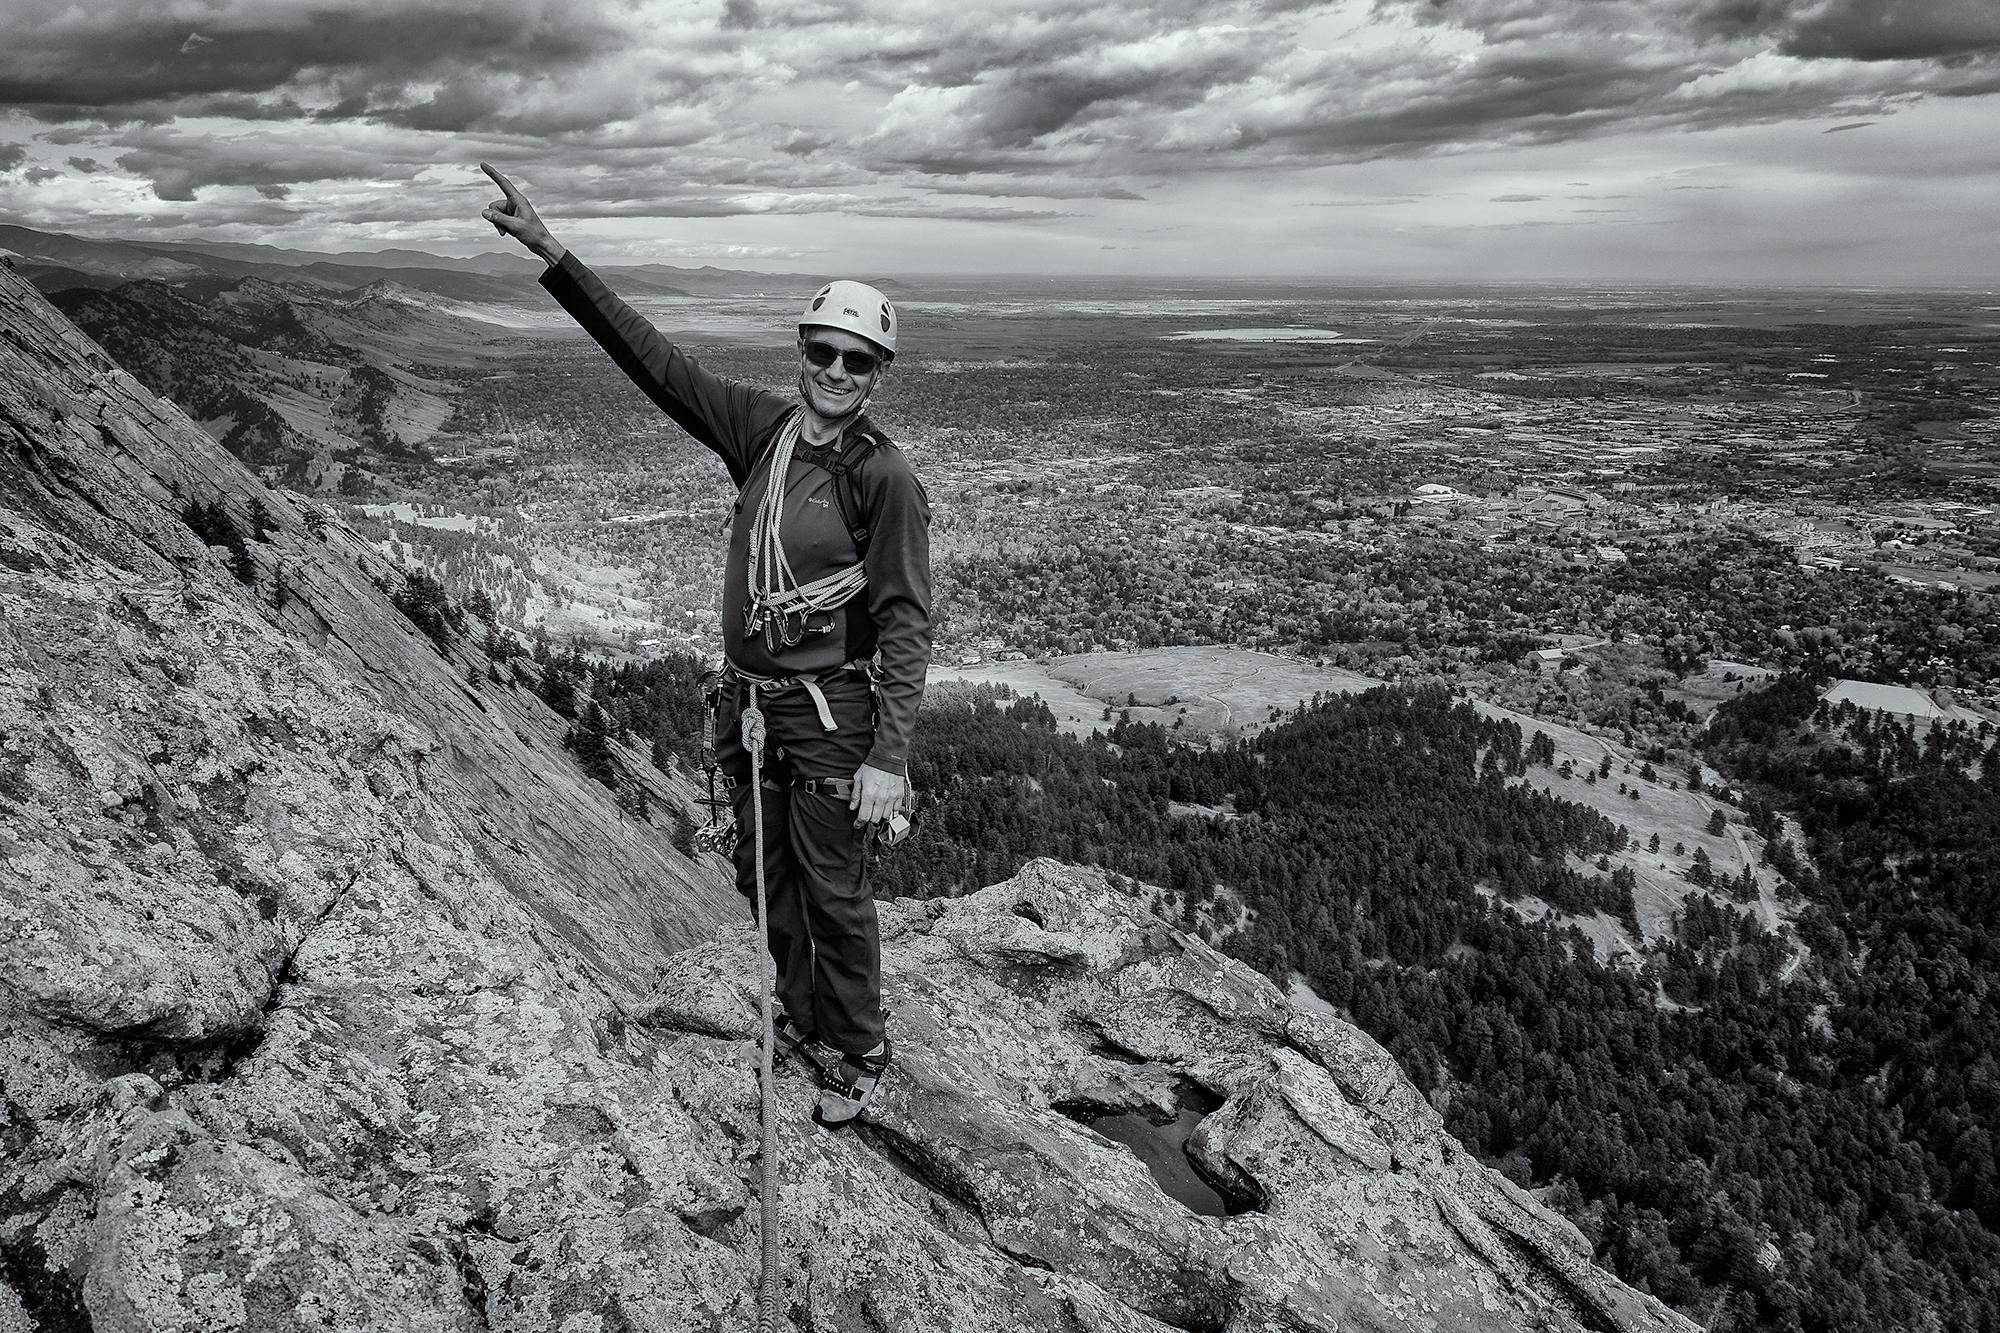 Onward and Upward. Gary, on the Third Flatiron, Boulder, Colorado, 2015